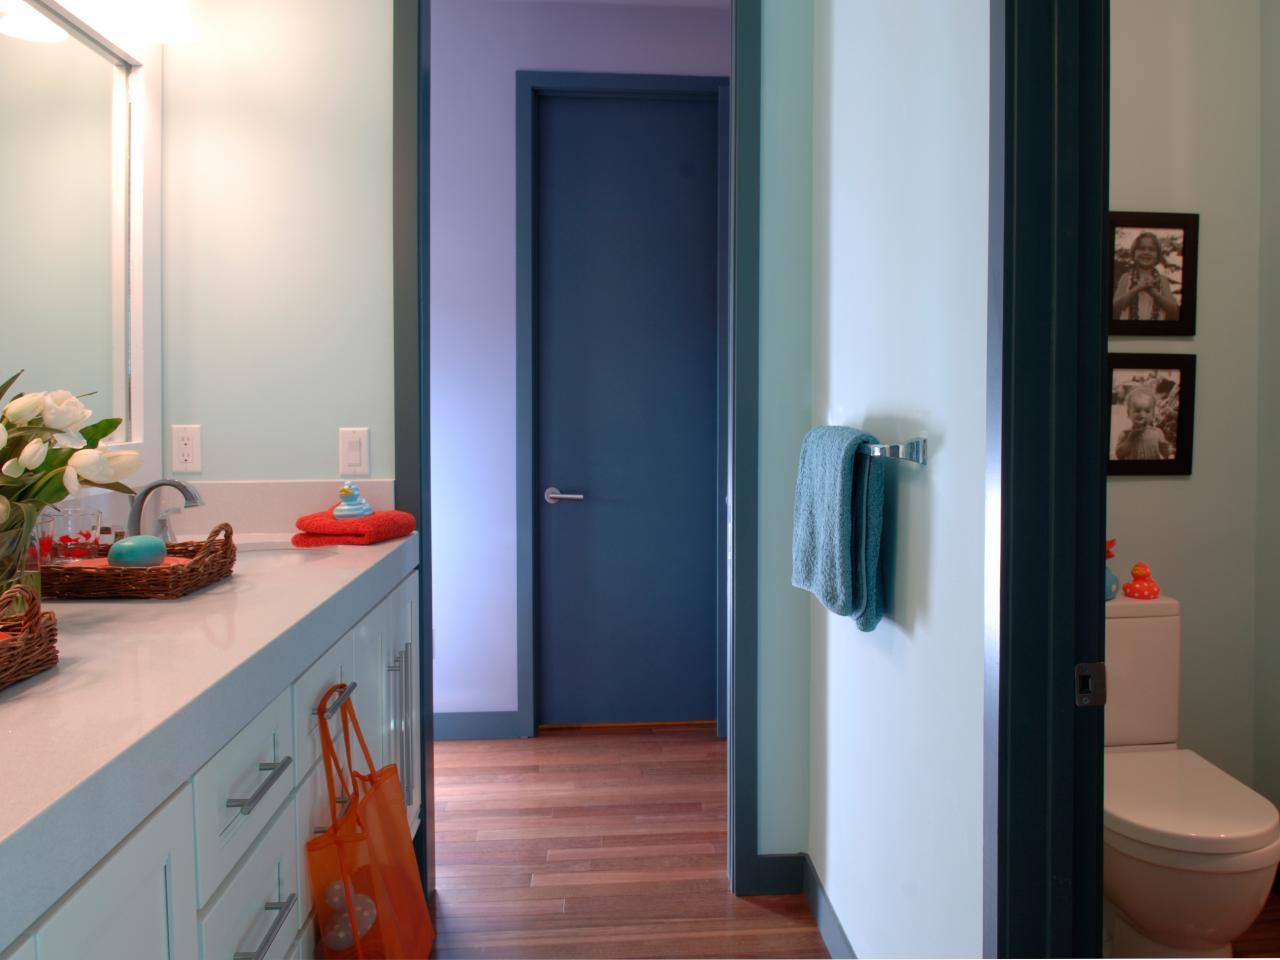 kids jack and jill bathroom ideas photo - 3